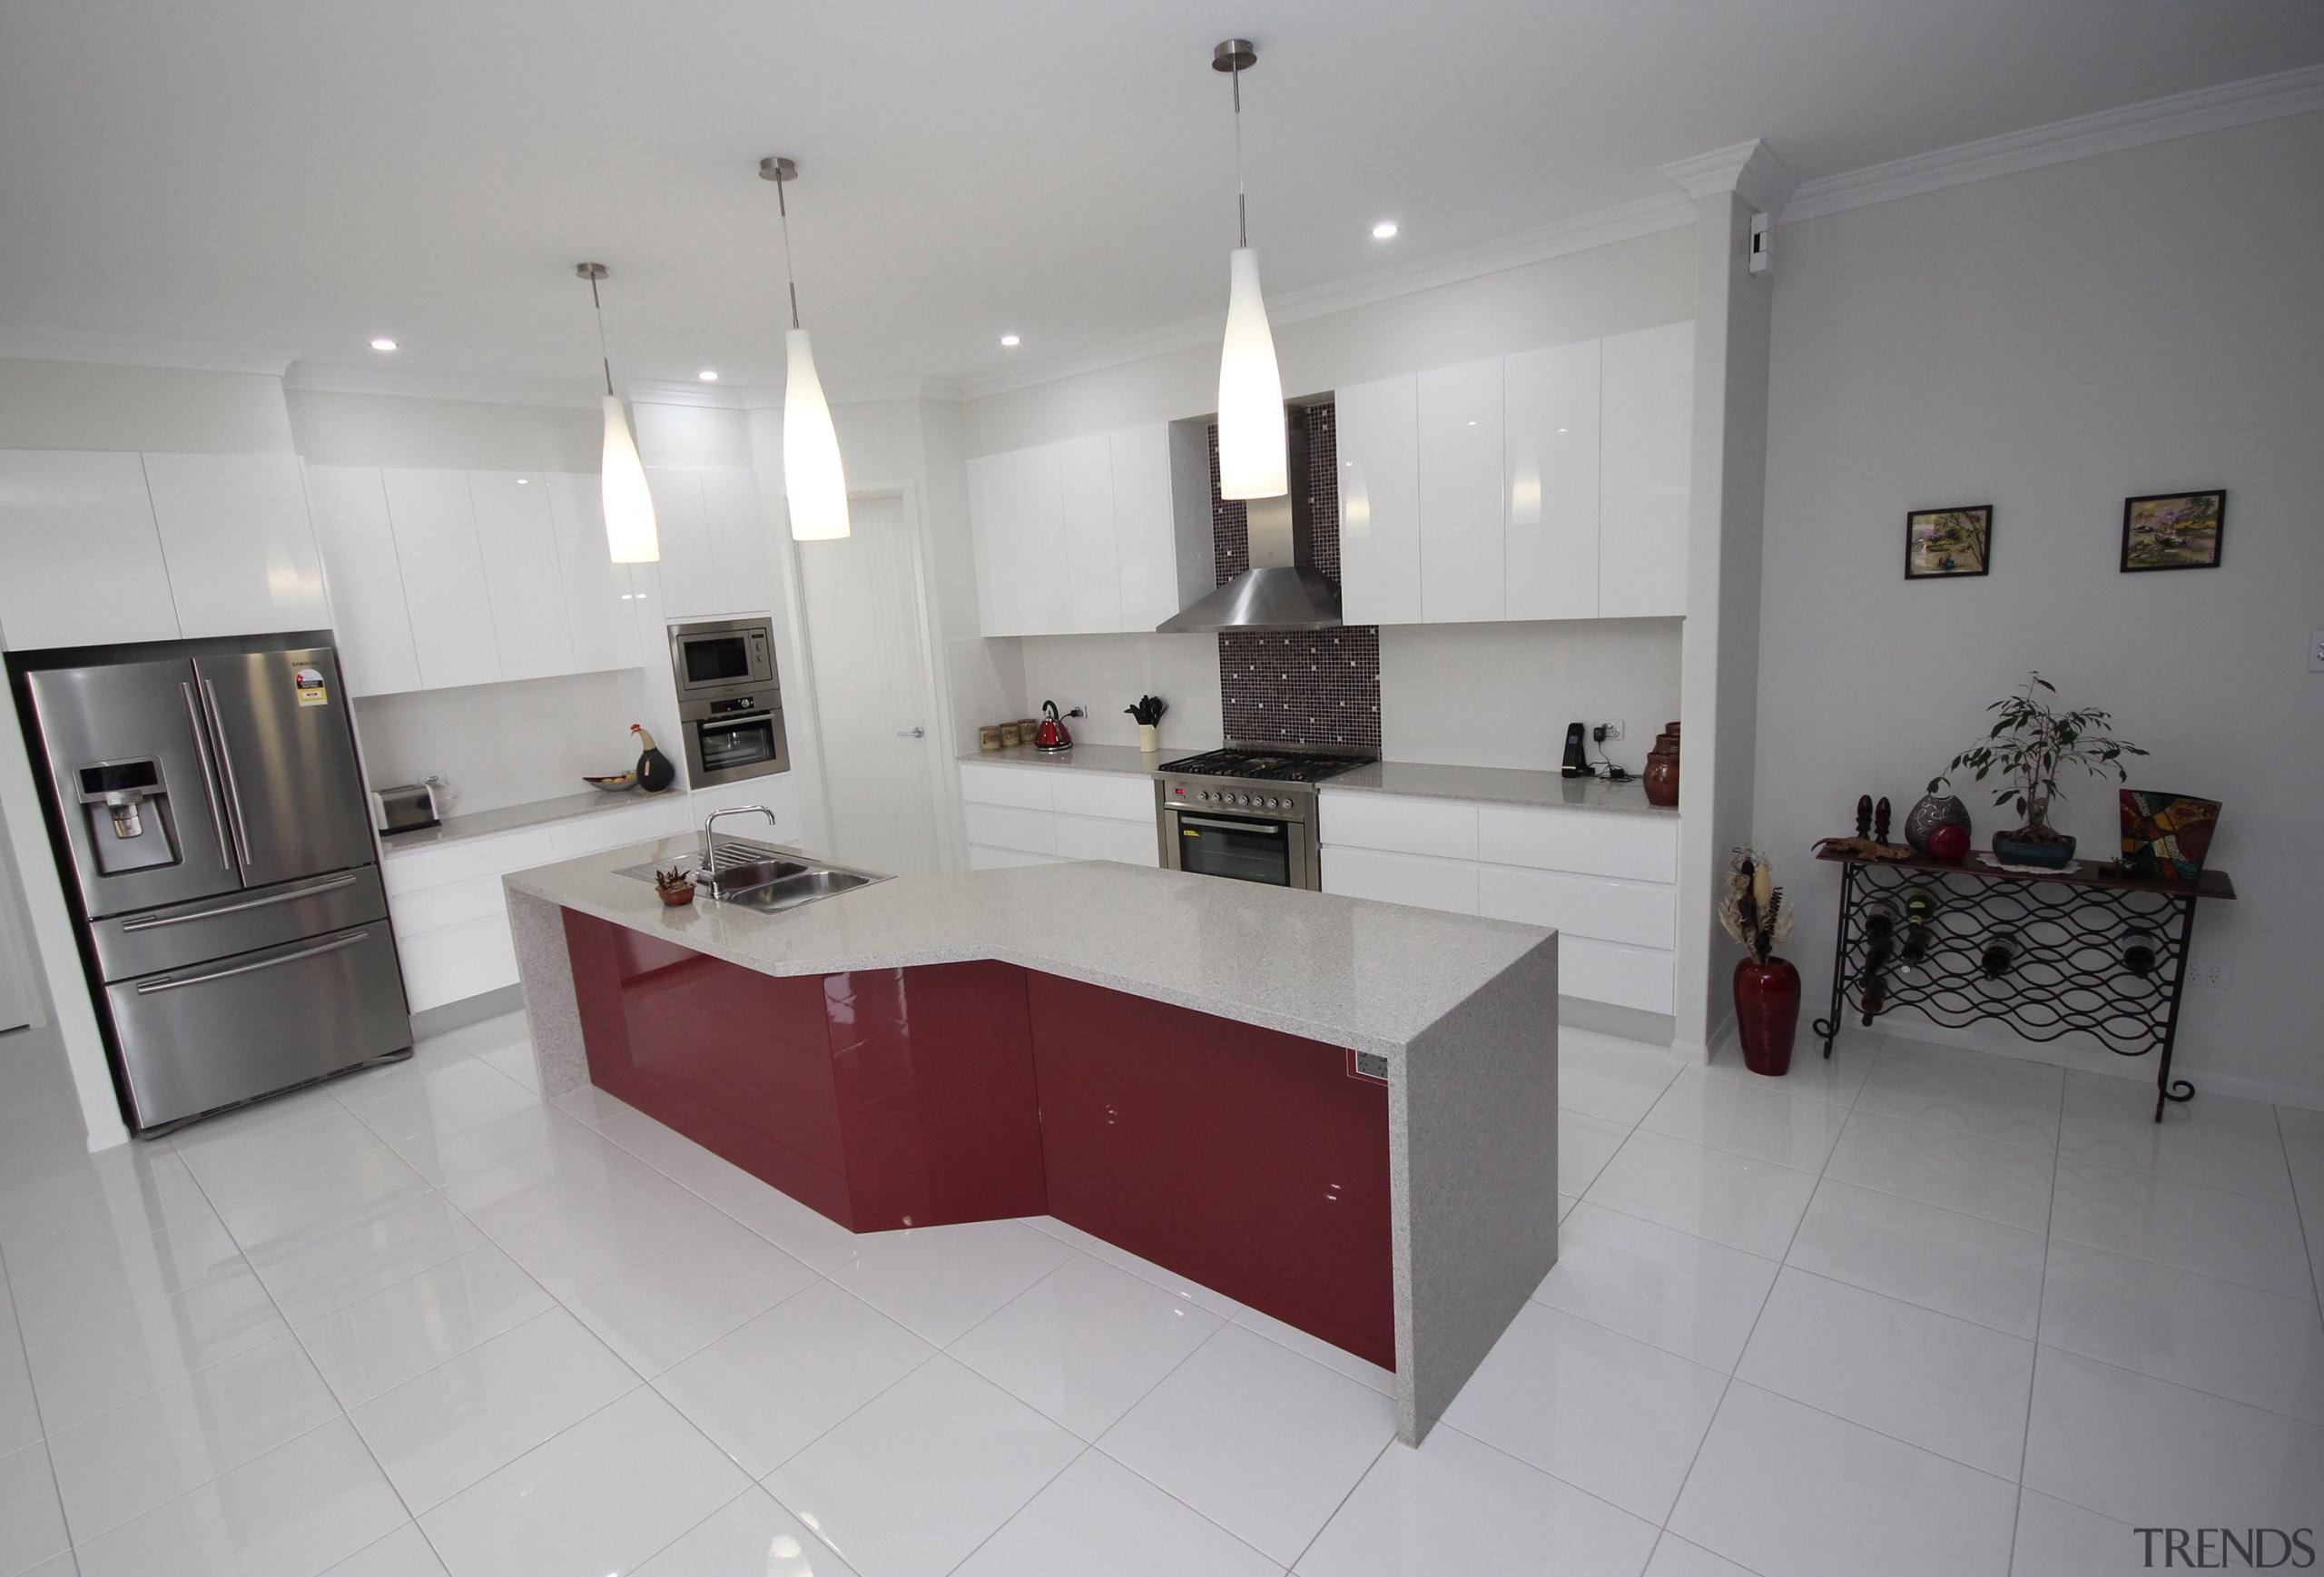 Winner Kitchen of the Year 2013 North Queensland countertop, floor, interior design, kitchen, property, real estate, room, gray